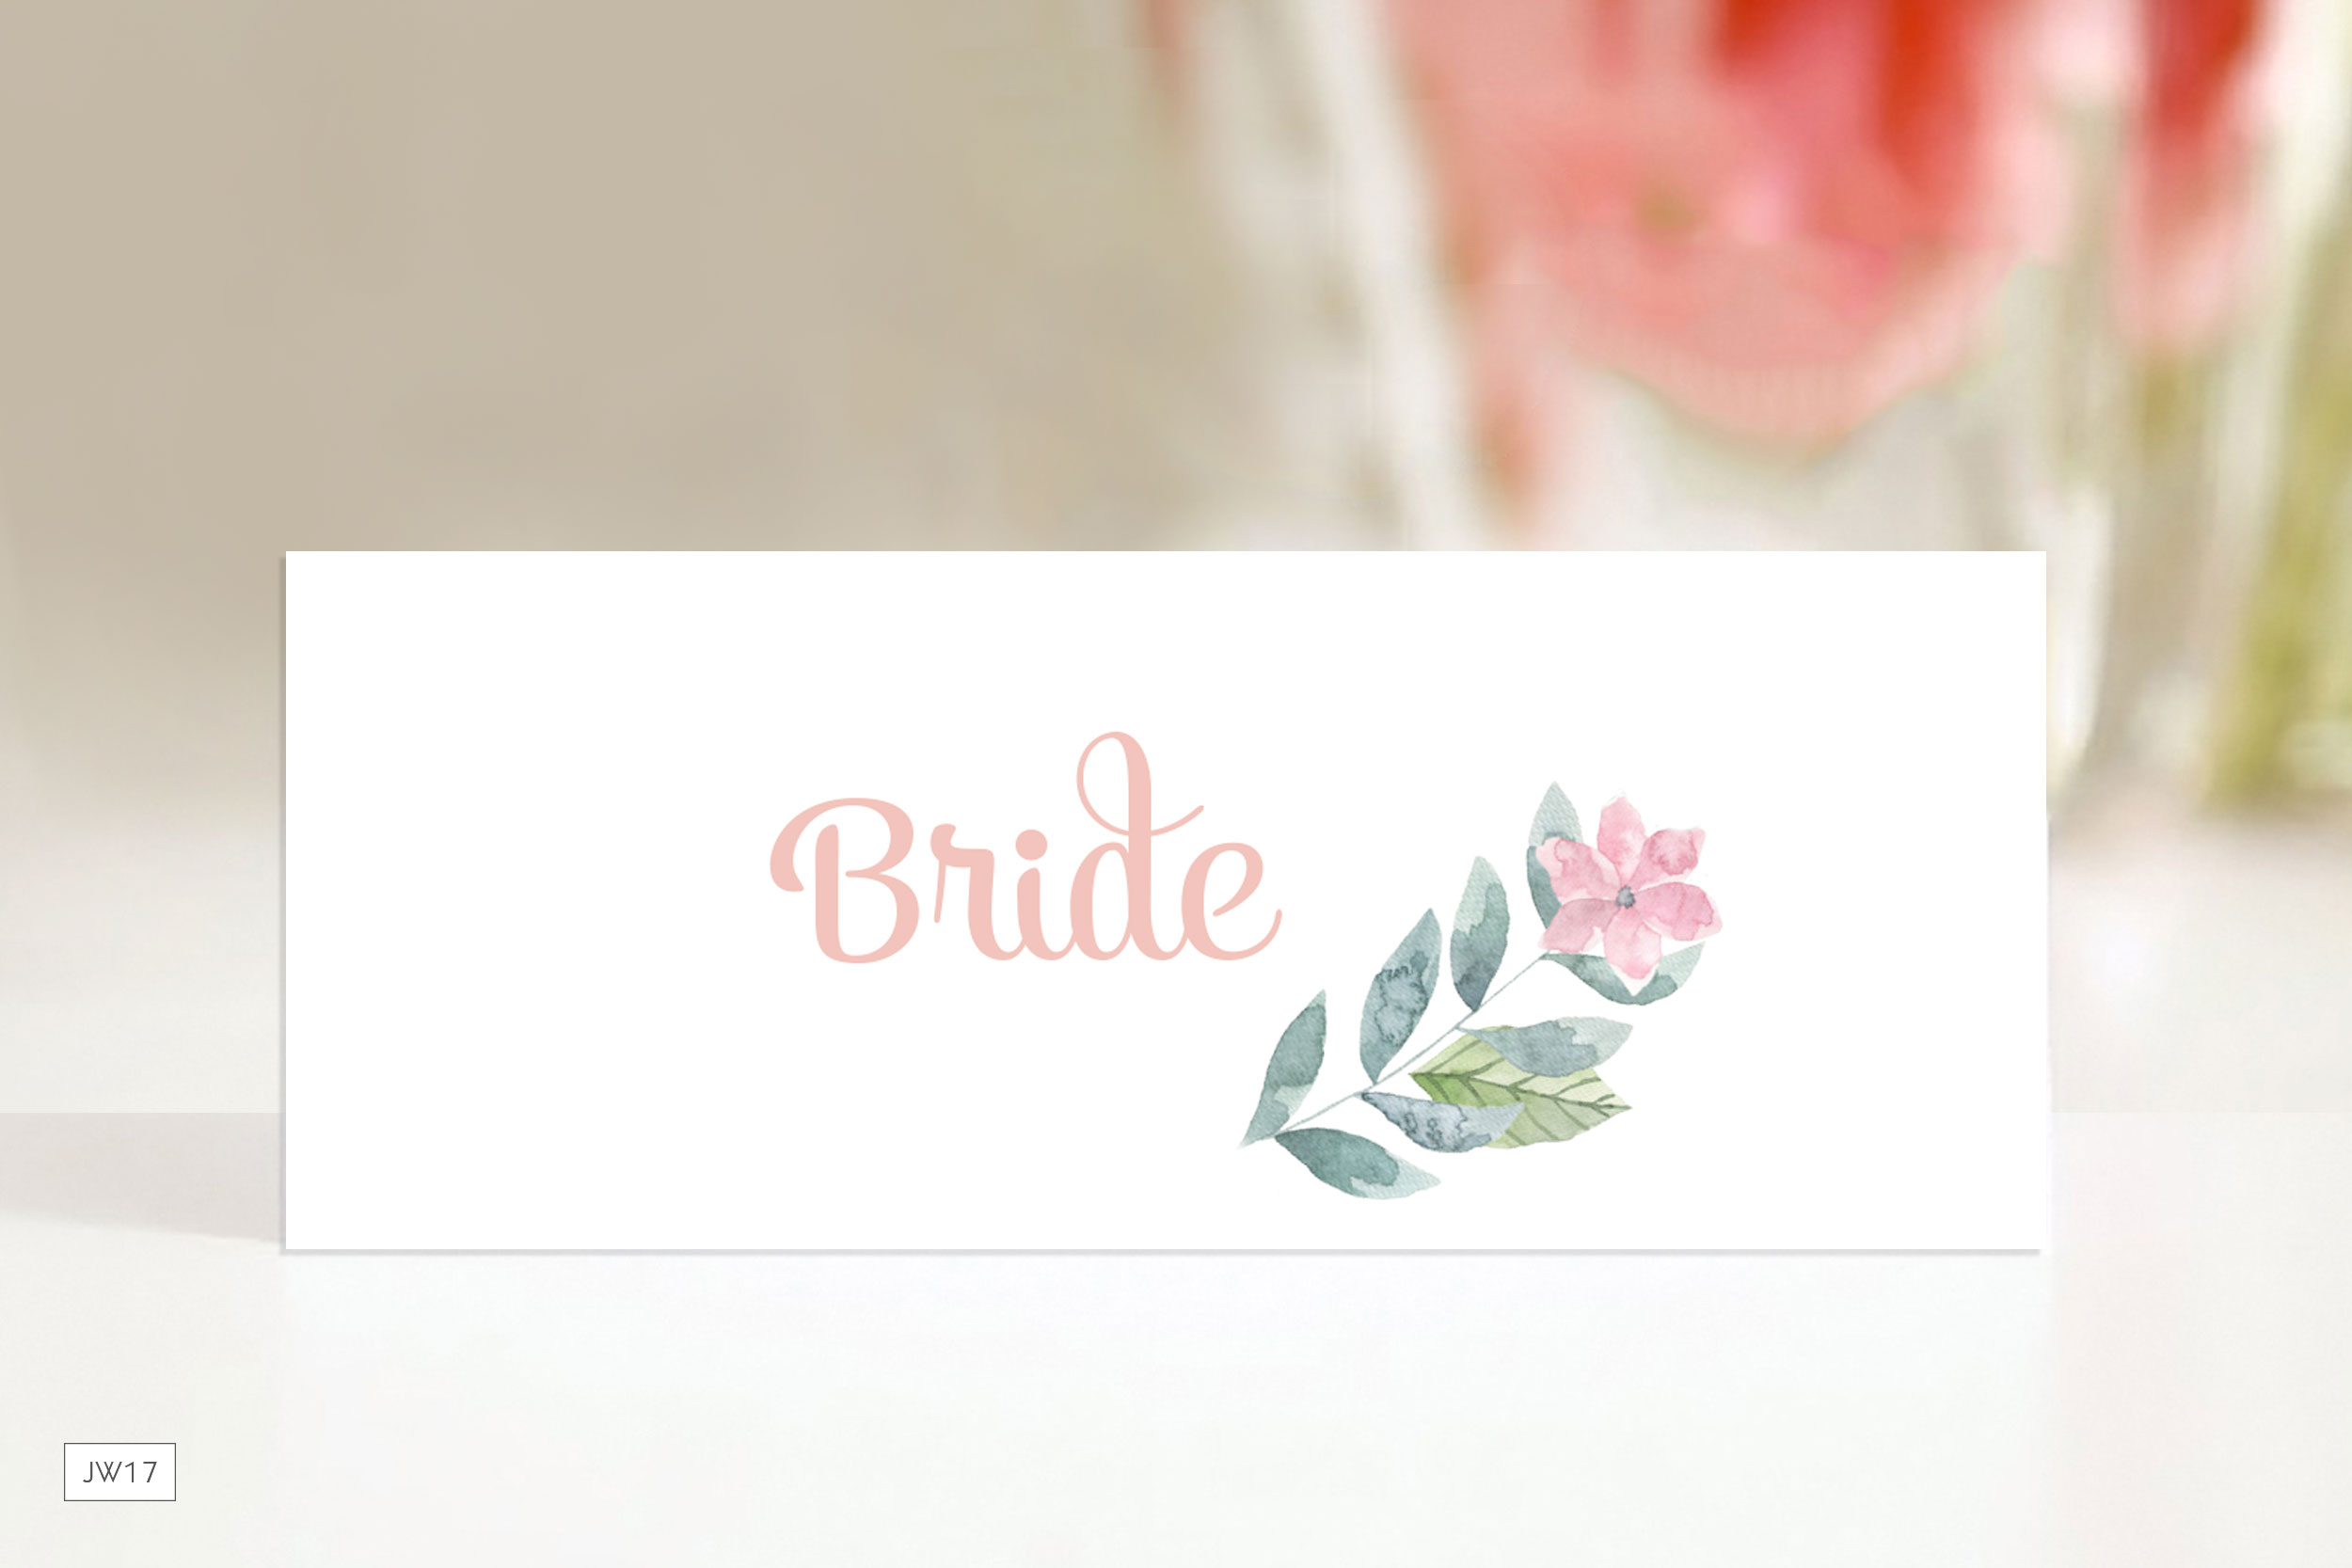 jersey-wedding-place-cards-jw17.jpg